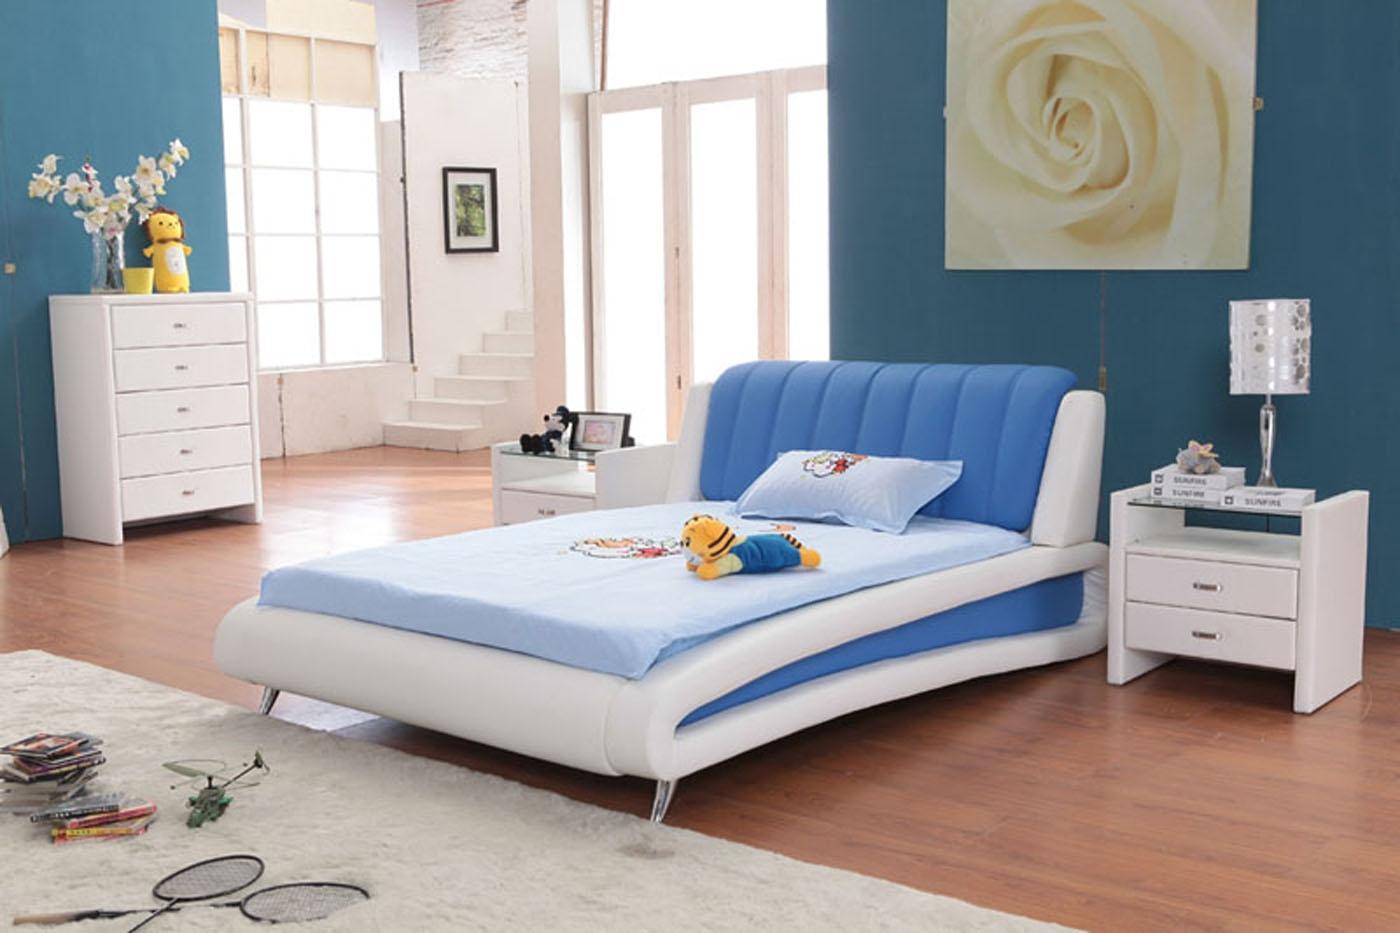 72 Kamar Tidur Anak Perempuan Minimalis Warna Biru Yang Nampak